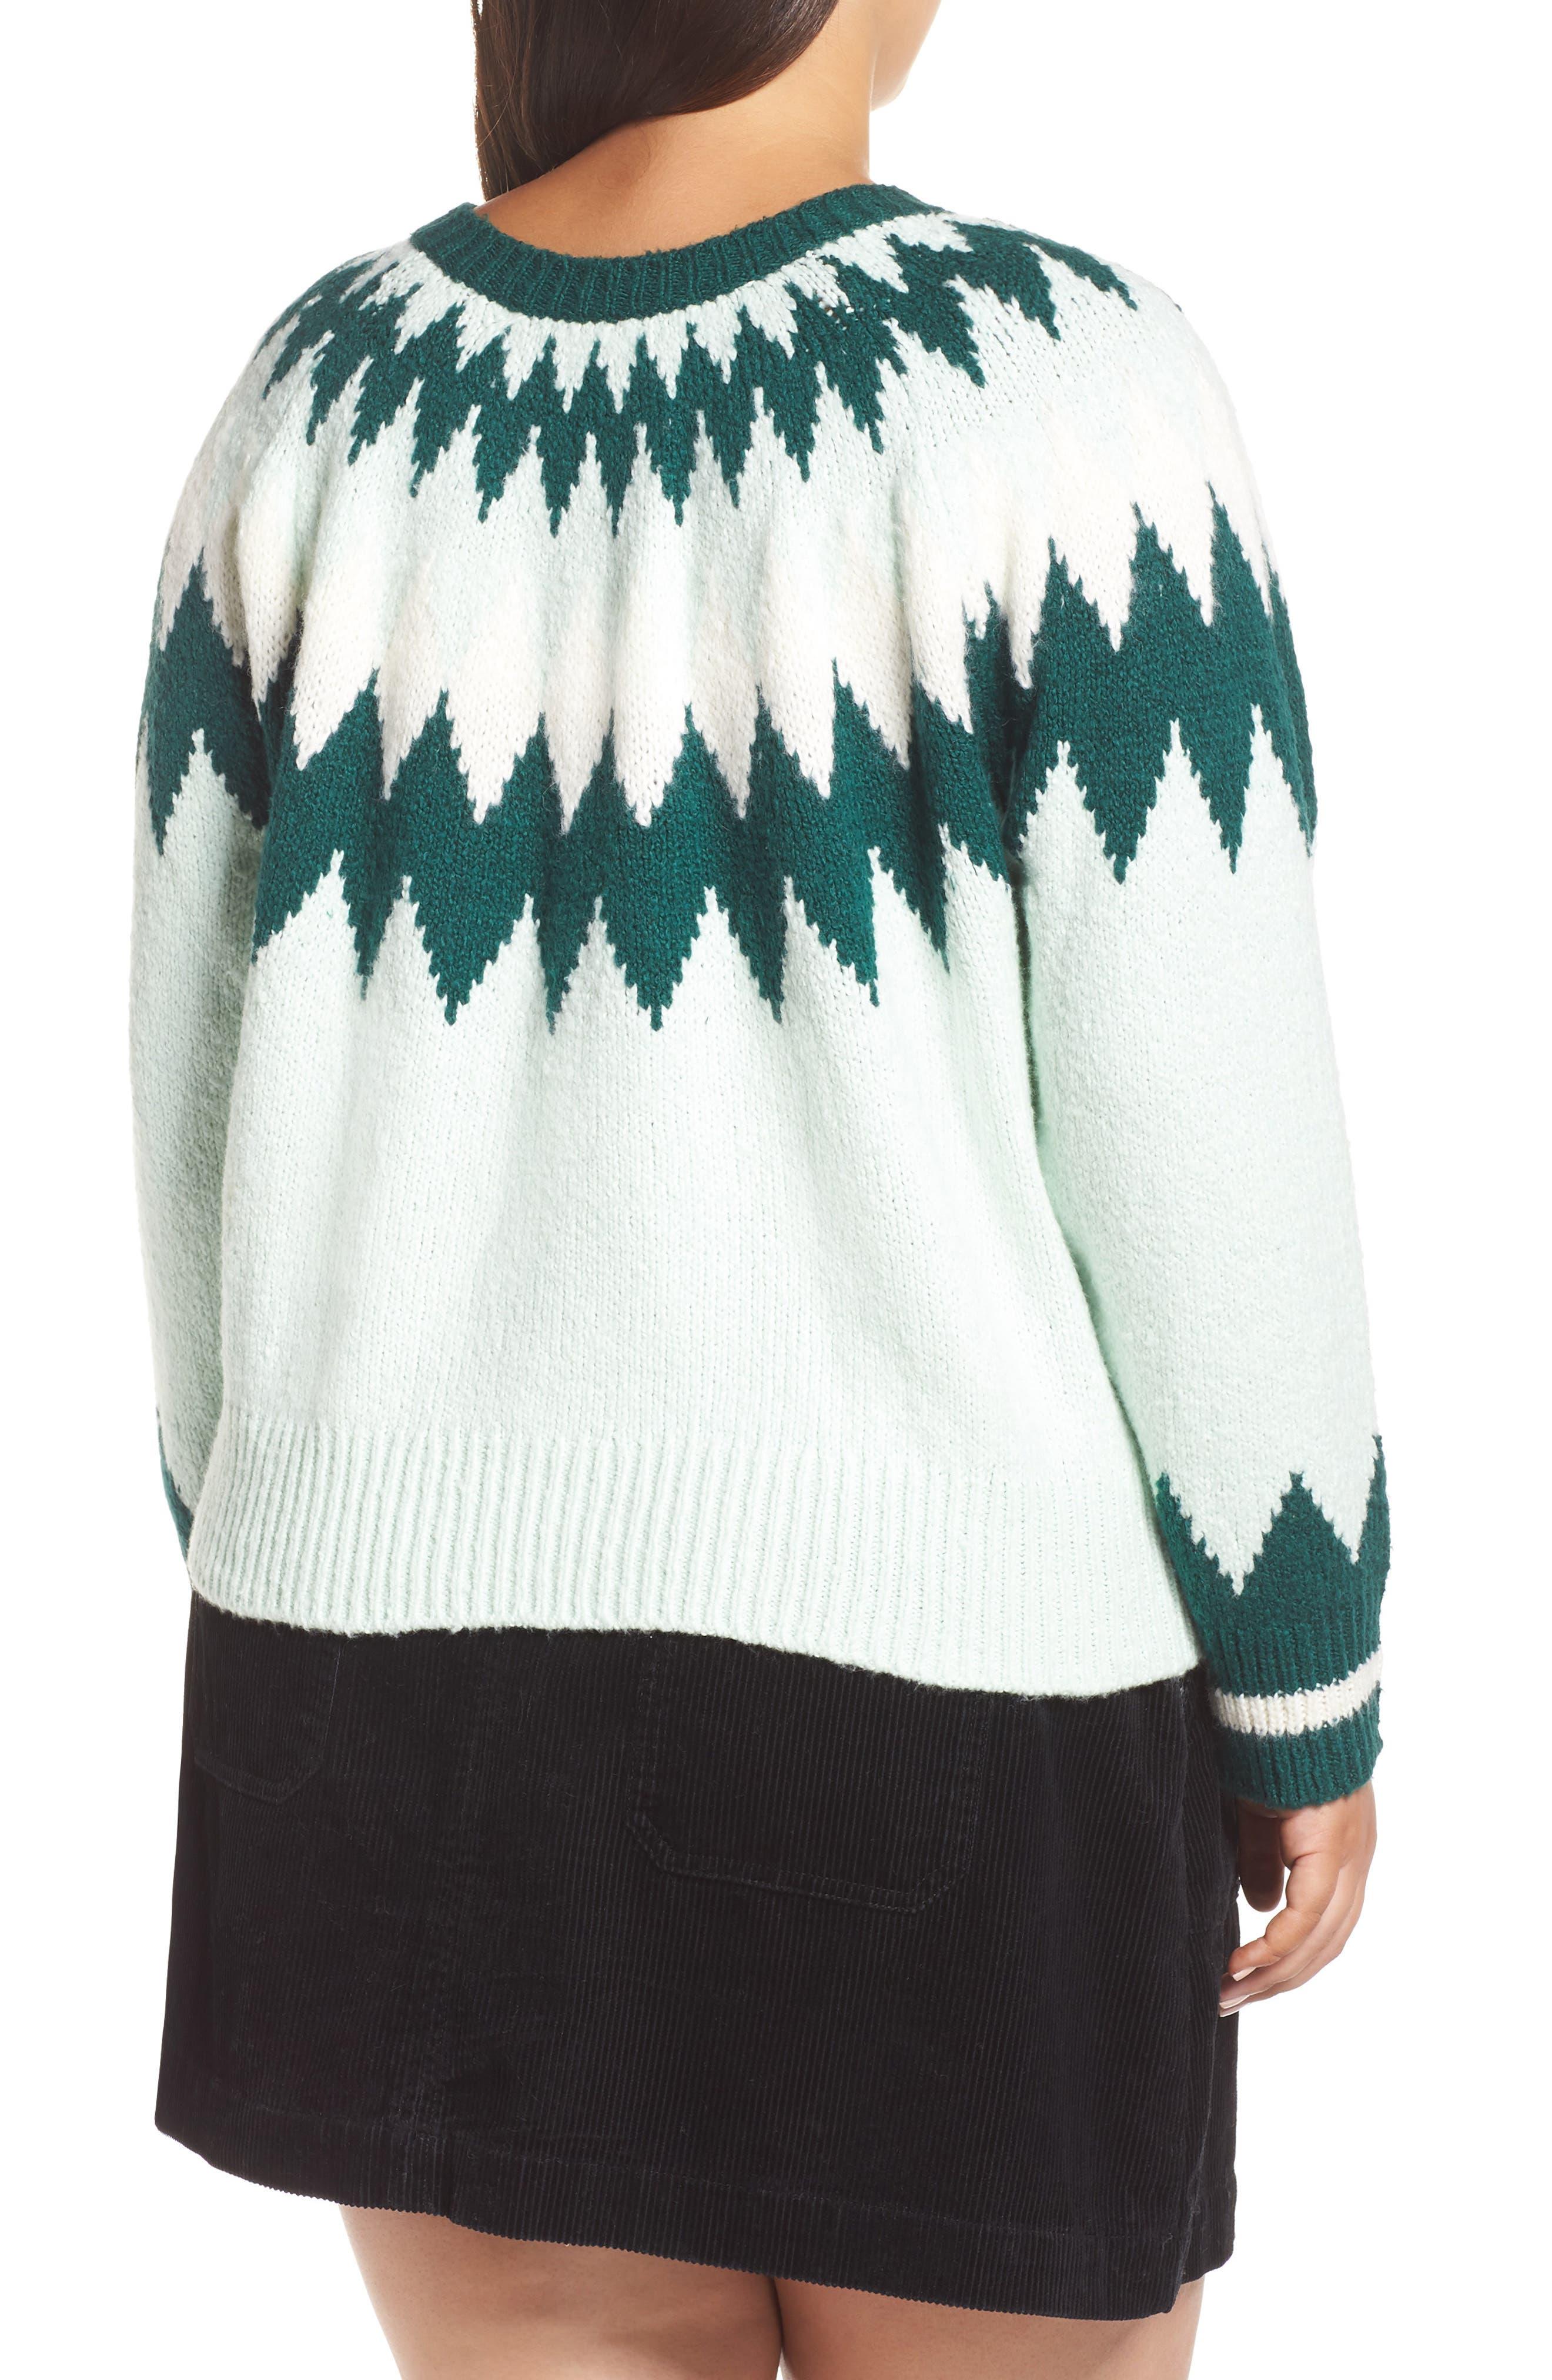 Cozy Ski Sweater,                             Alternate thumbnail 2, color,                             GREEN PLACID FAIRISLE